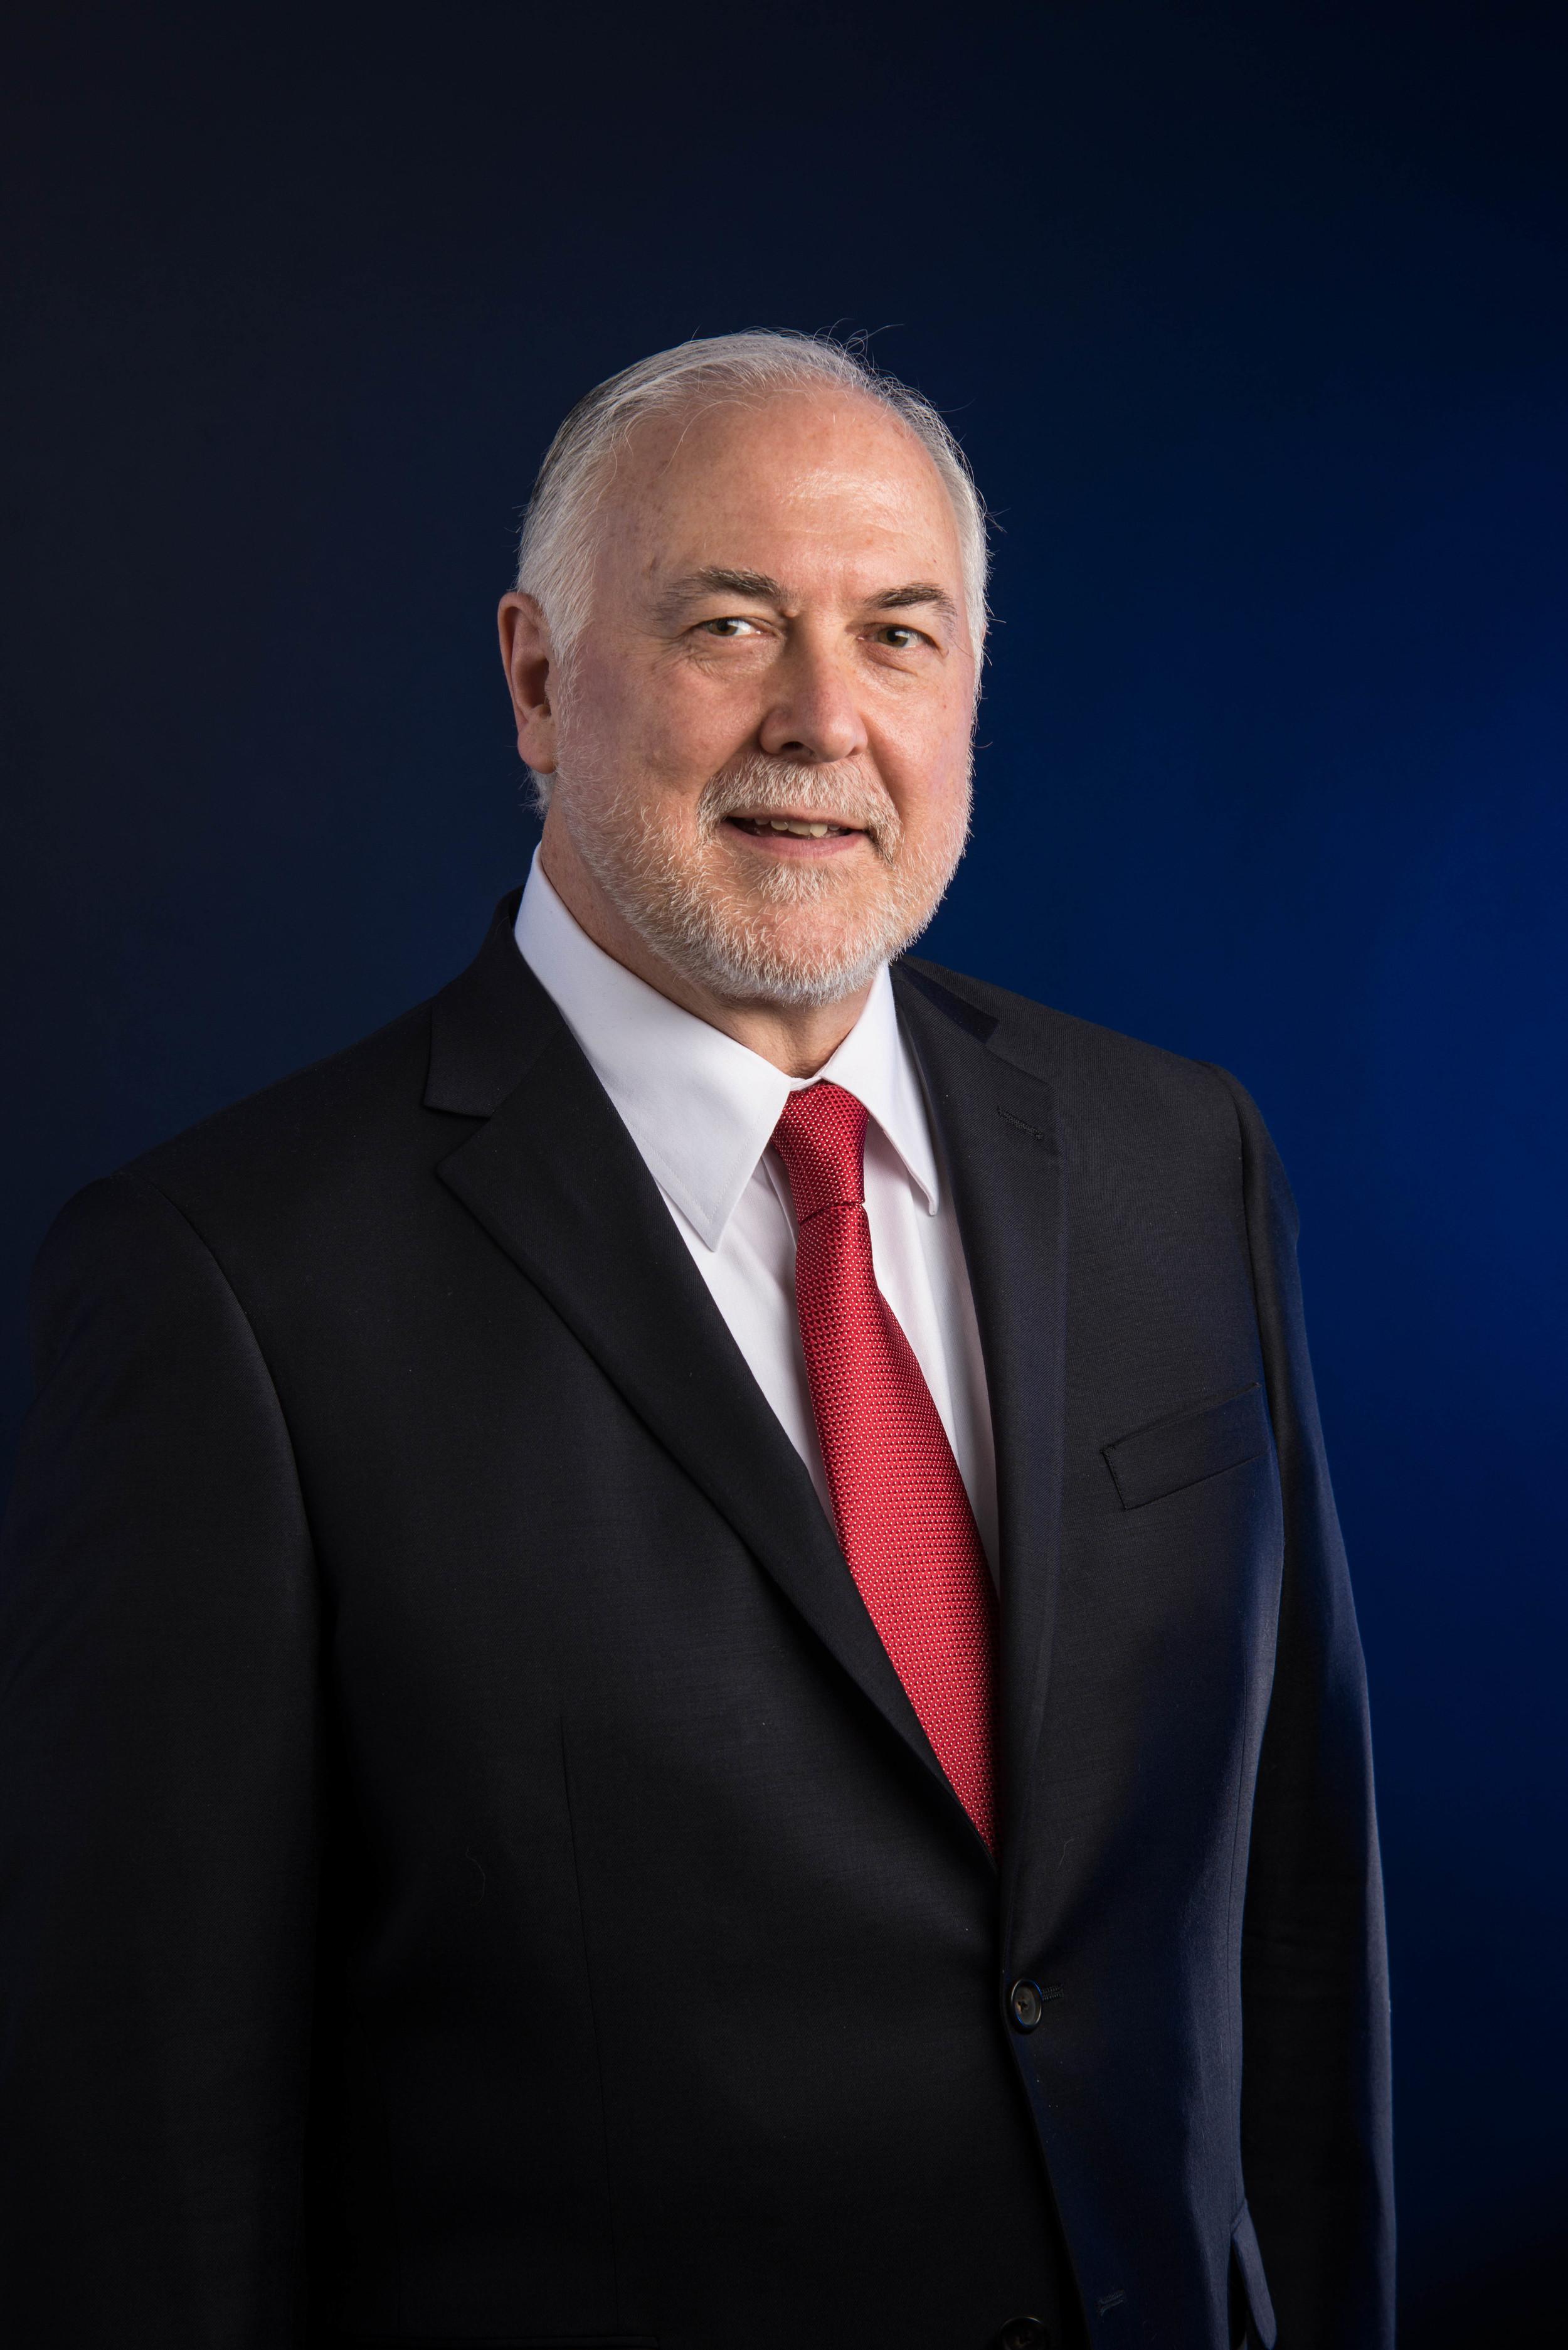 Michael K. Tomenga